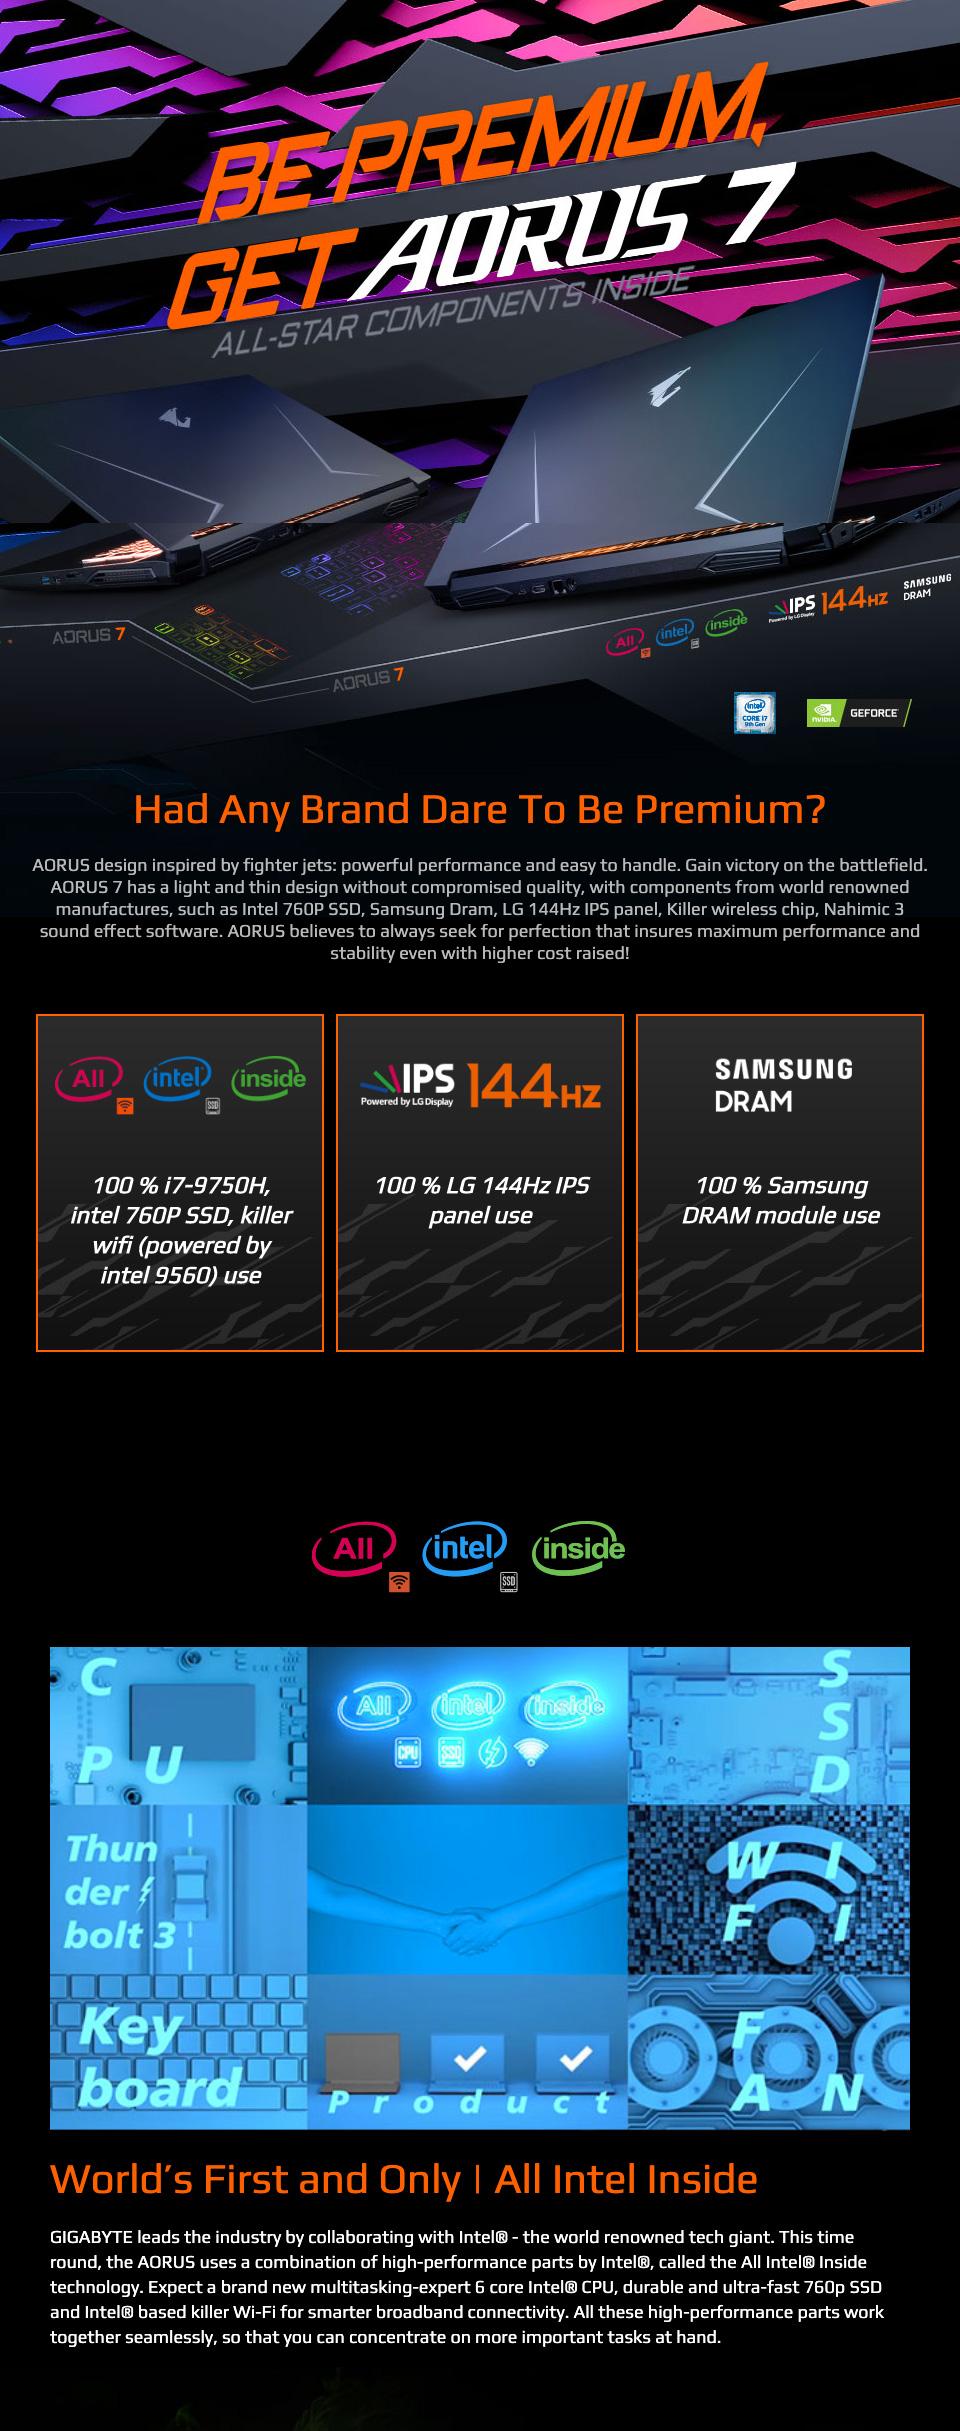 Gigabyte Aorus 7 Core i7 GTX 1660Ti 17.3in 144 Hz Notebook features